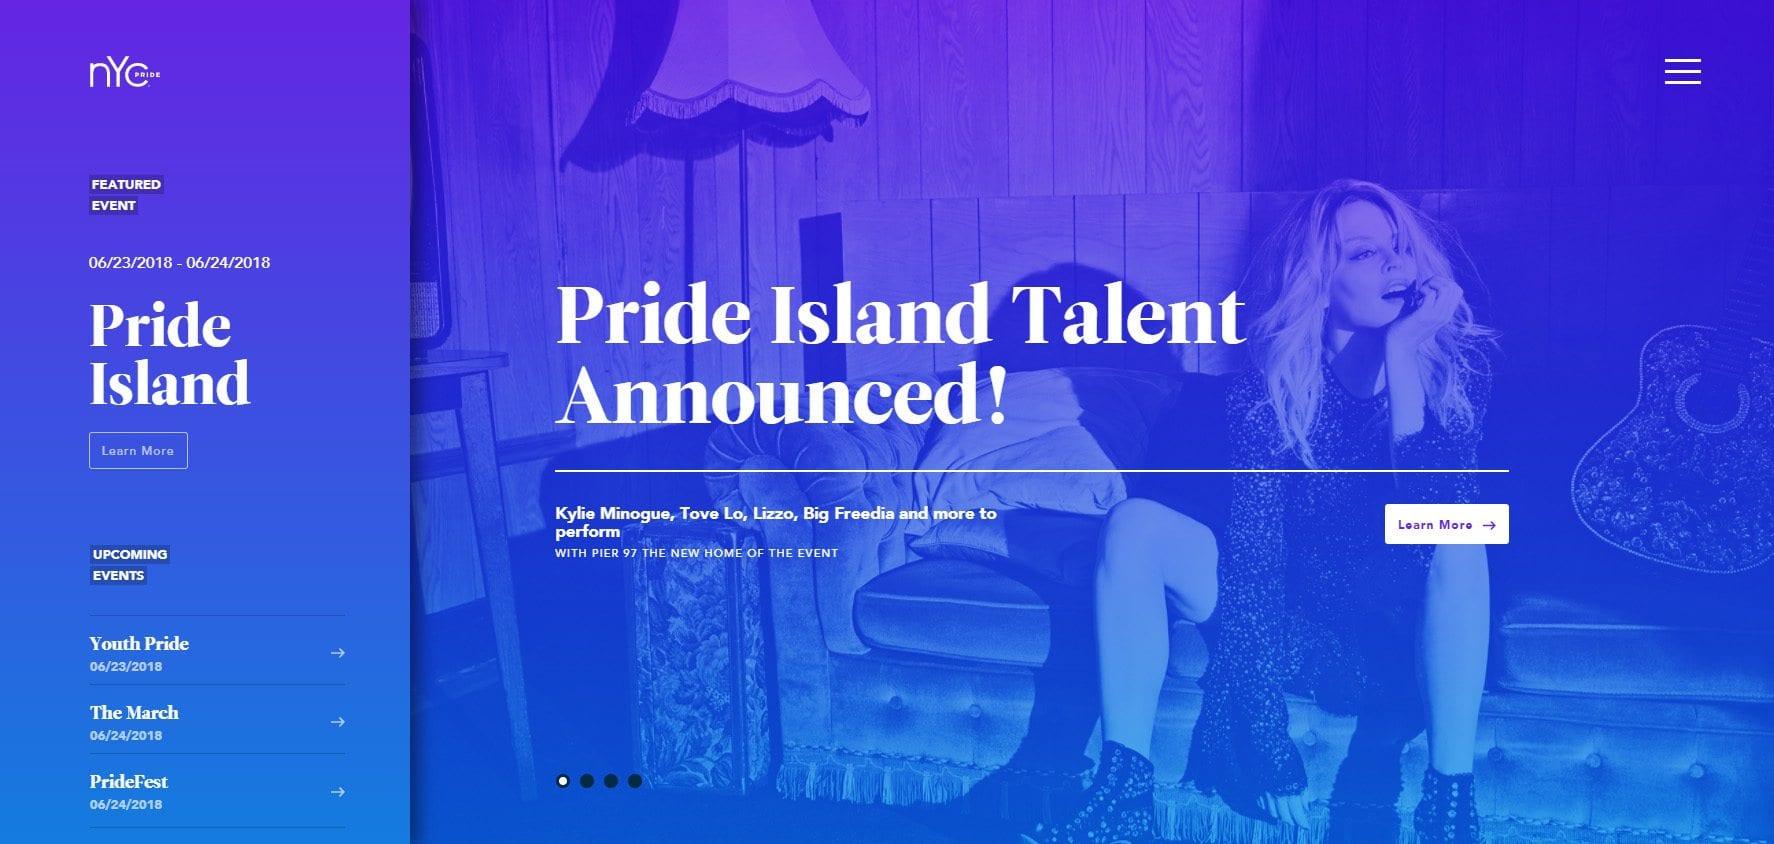 Pride Gradient image website